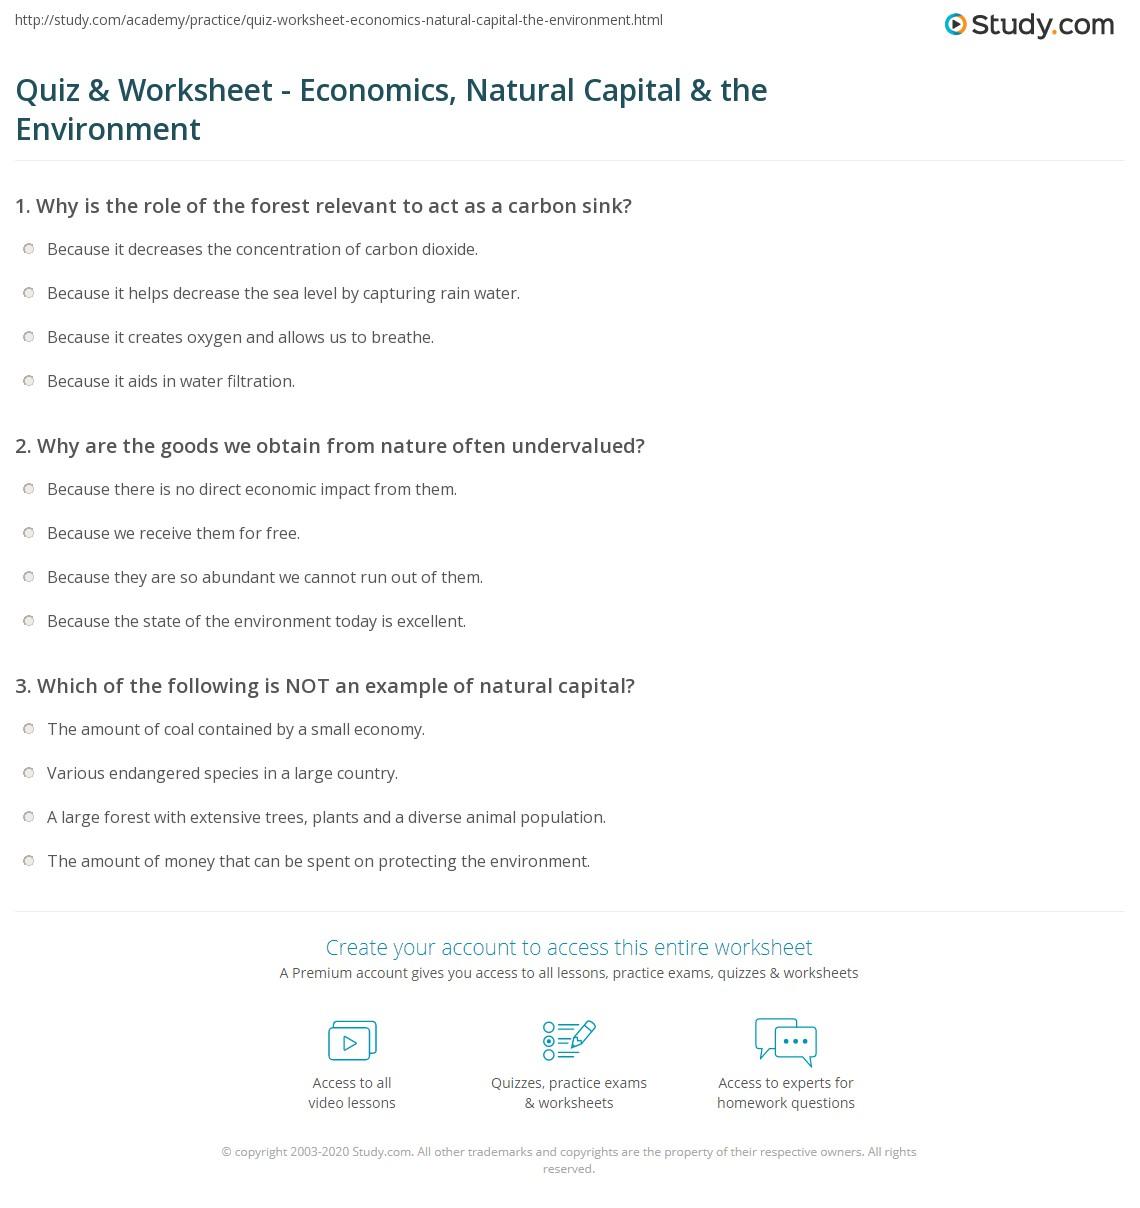 high school economics worksheets Termolak – High School Economics Worksheets